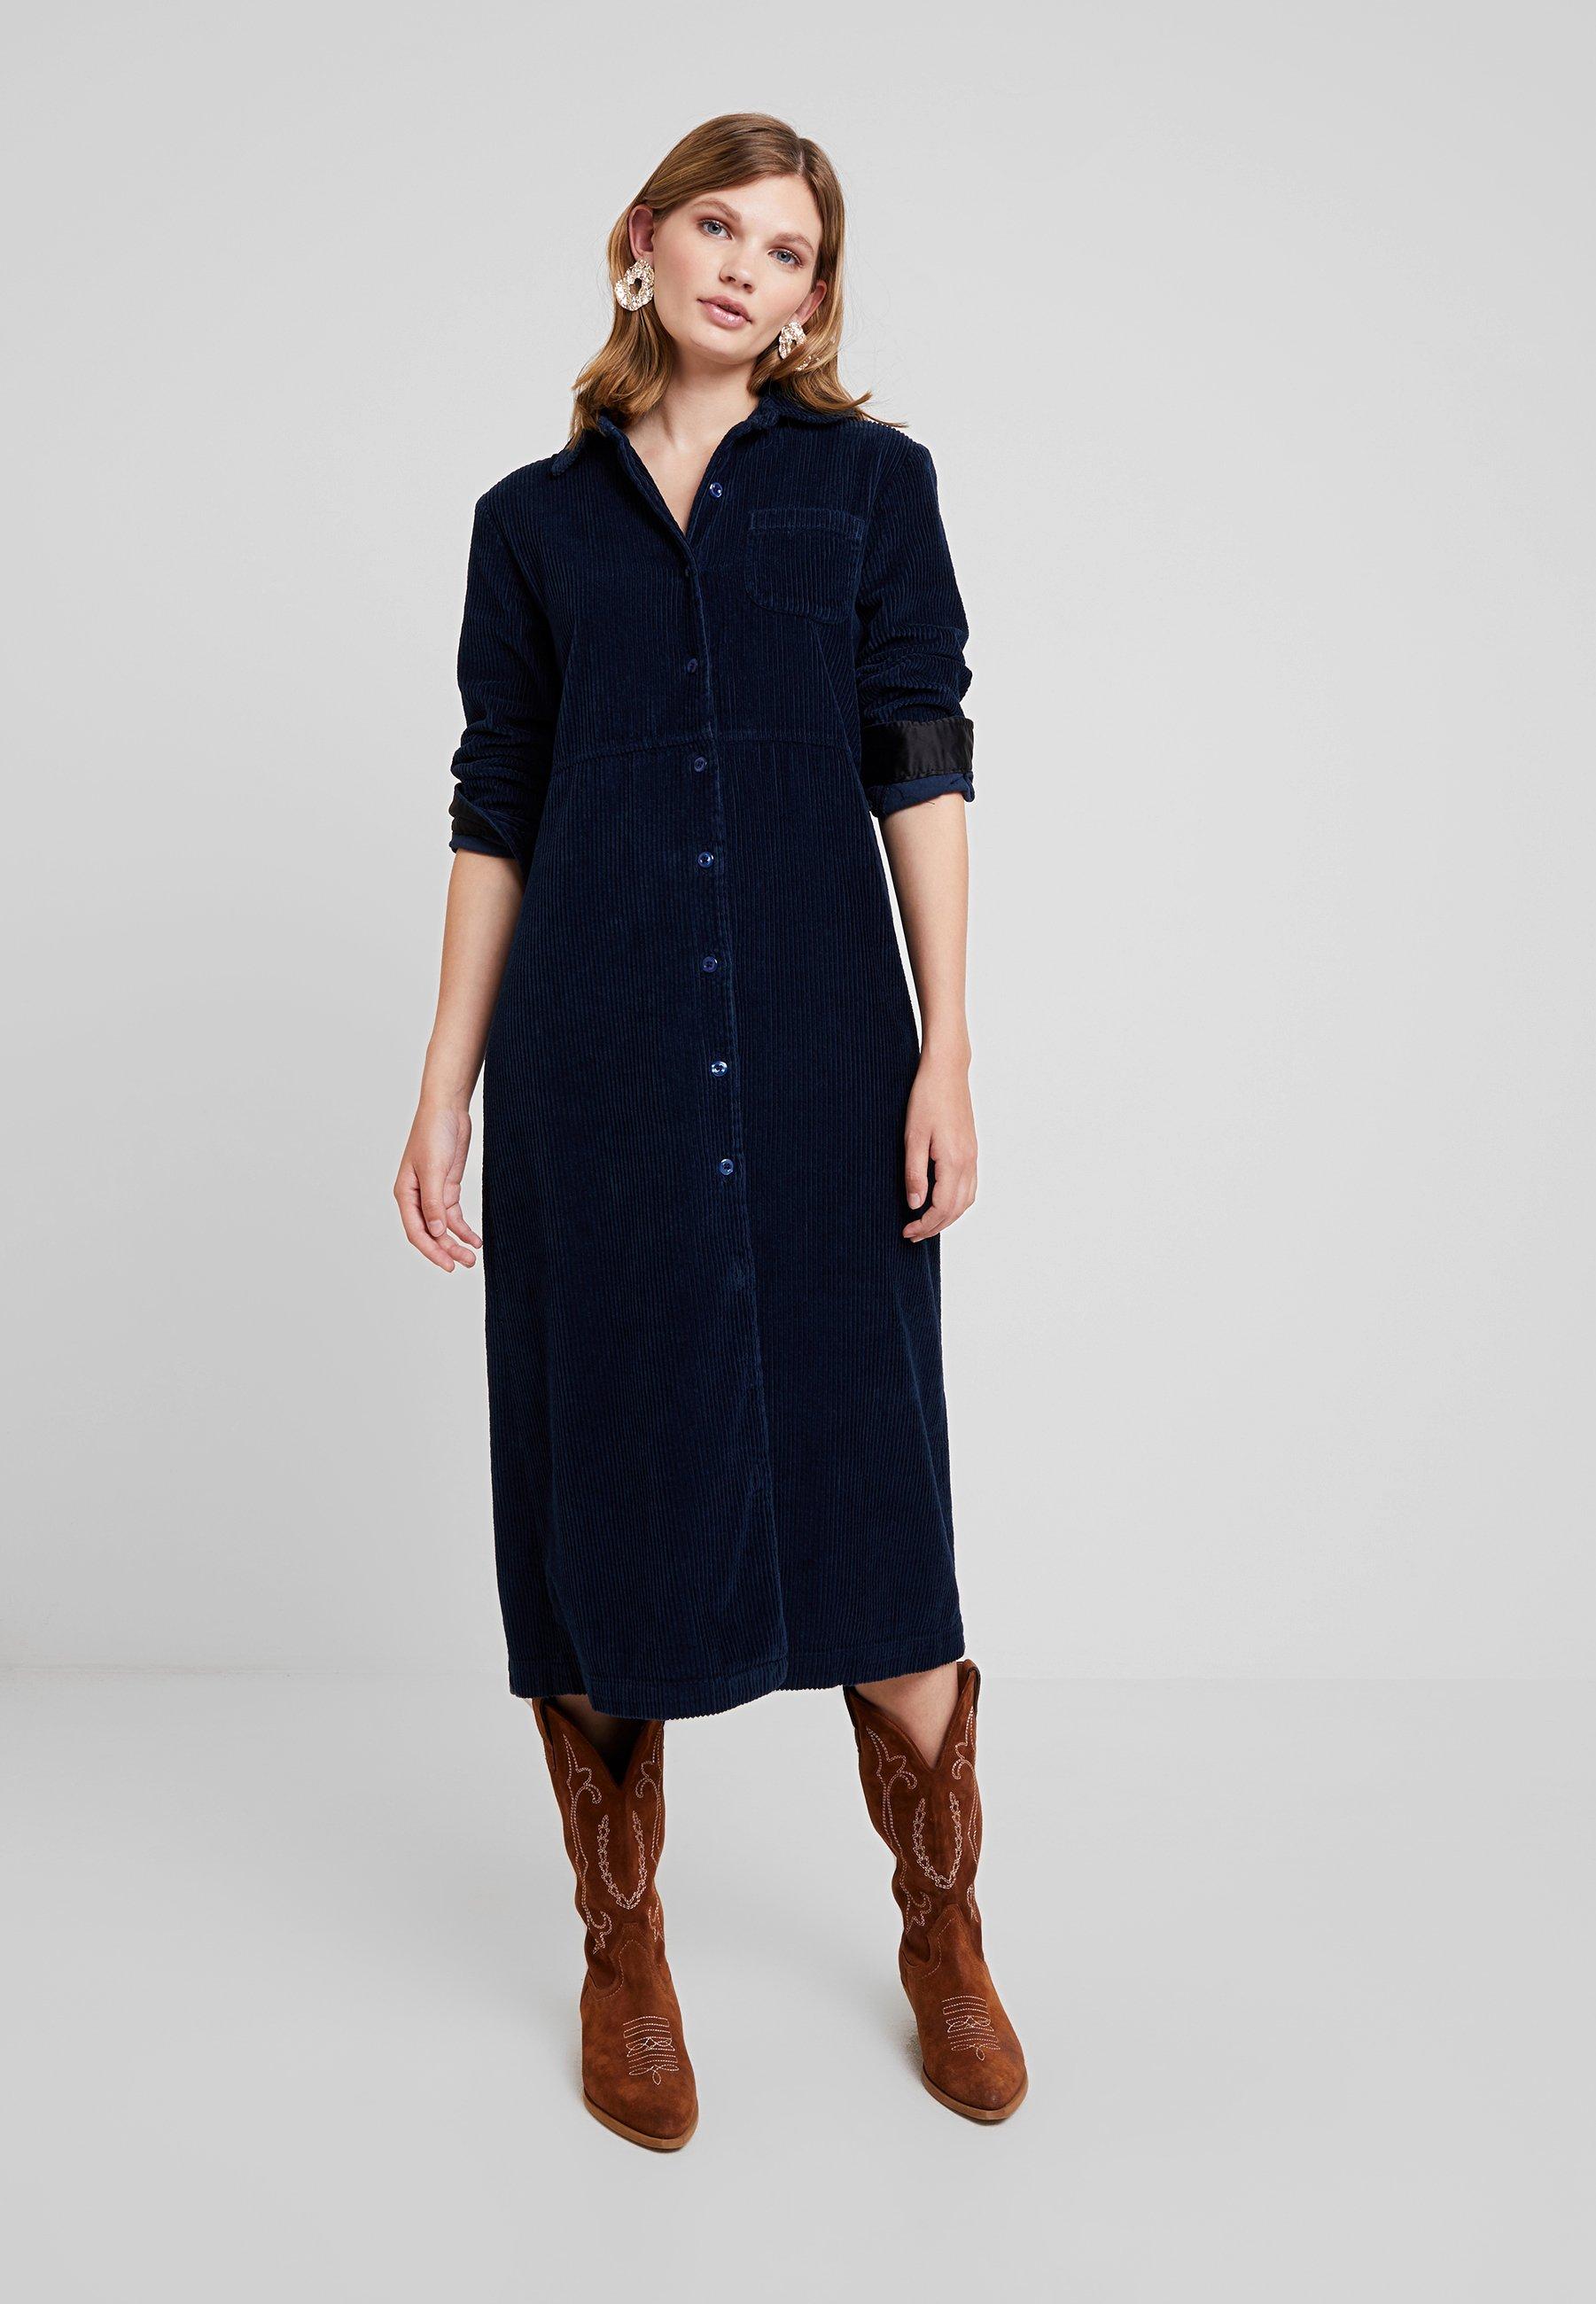 prima superficie realeza  LOIS Jeans SUNE - Vestido largo - marino/azul marino - Zalando.es